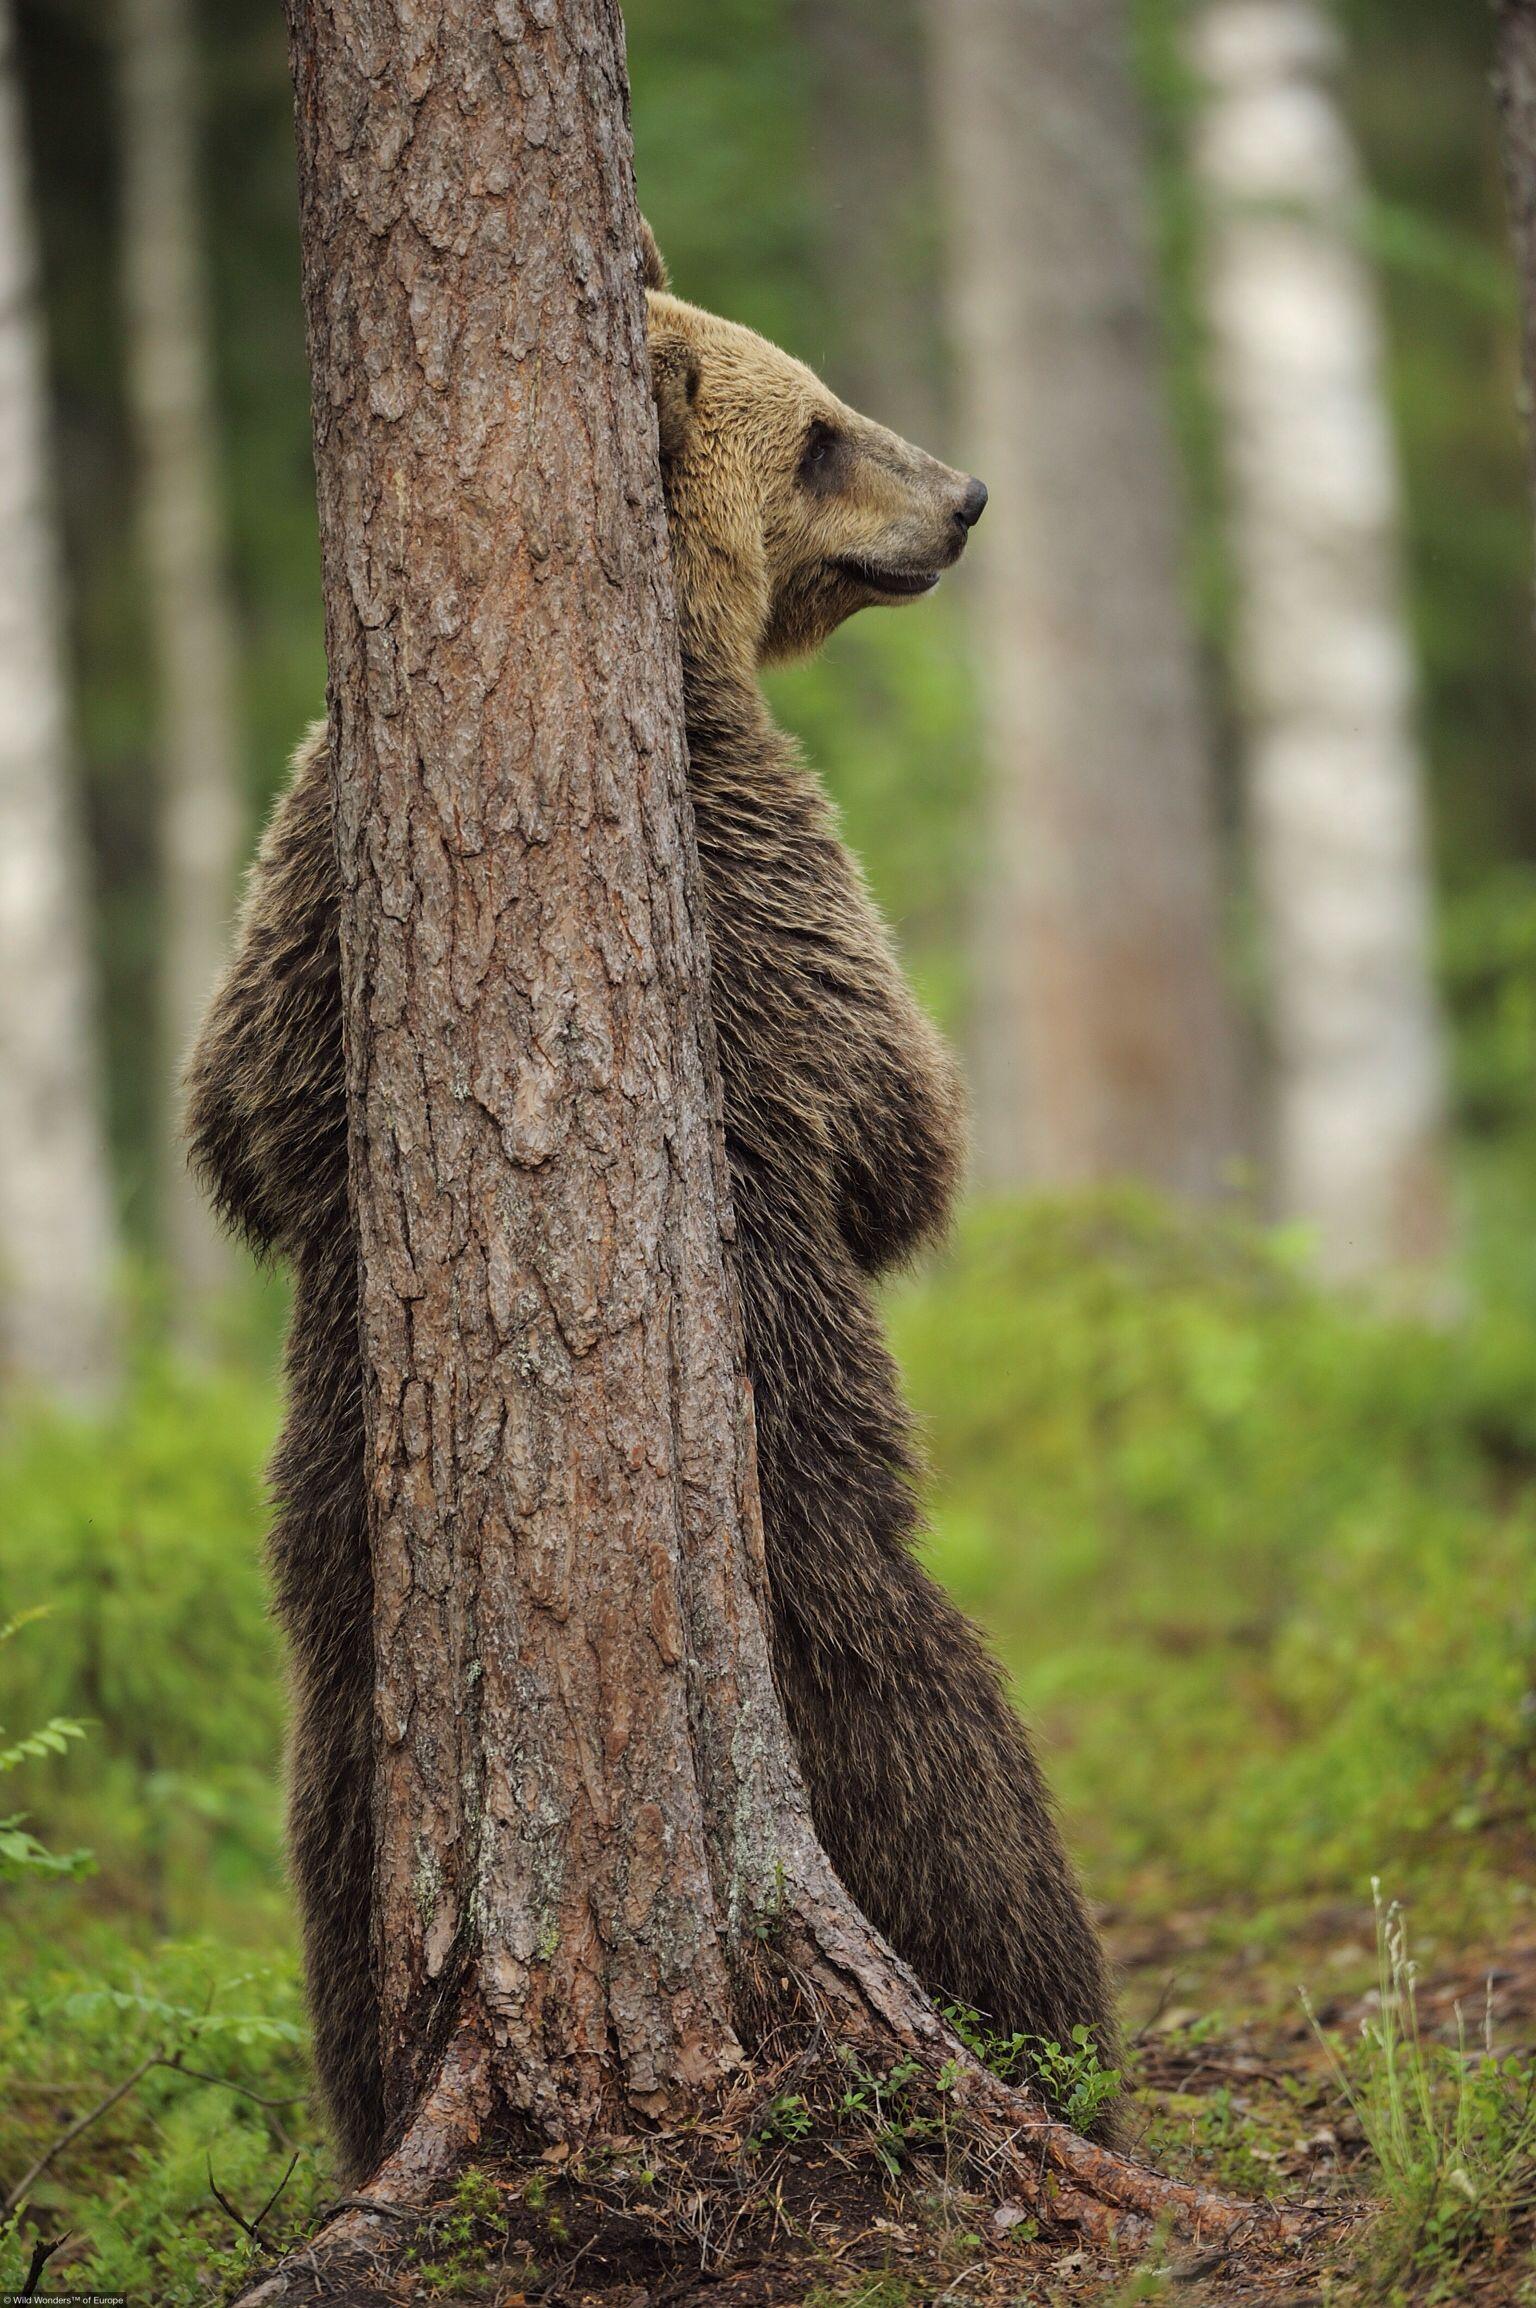 Brown Bear Hiding Behind A Tree